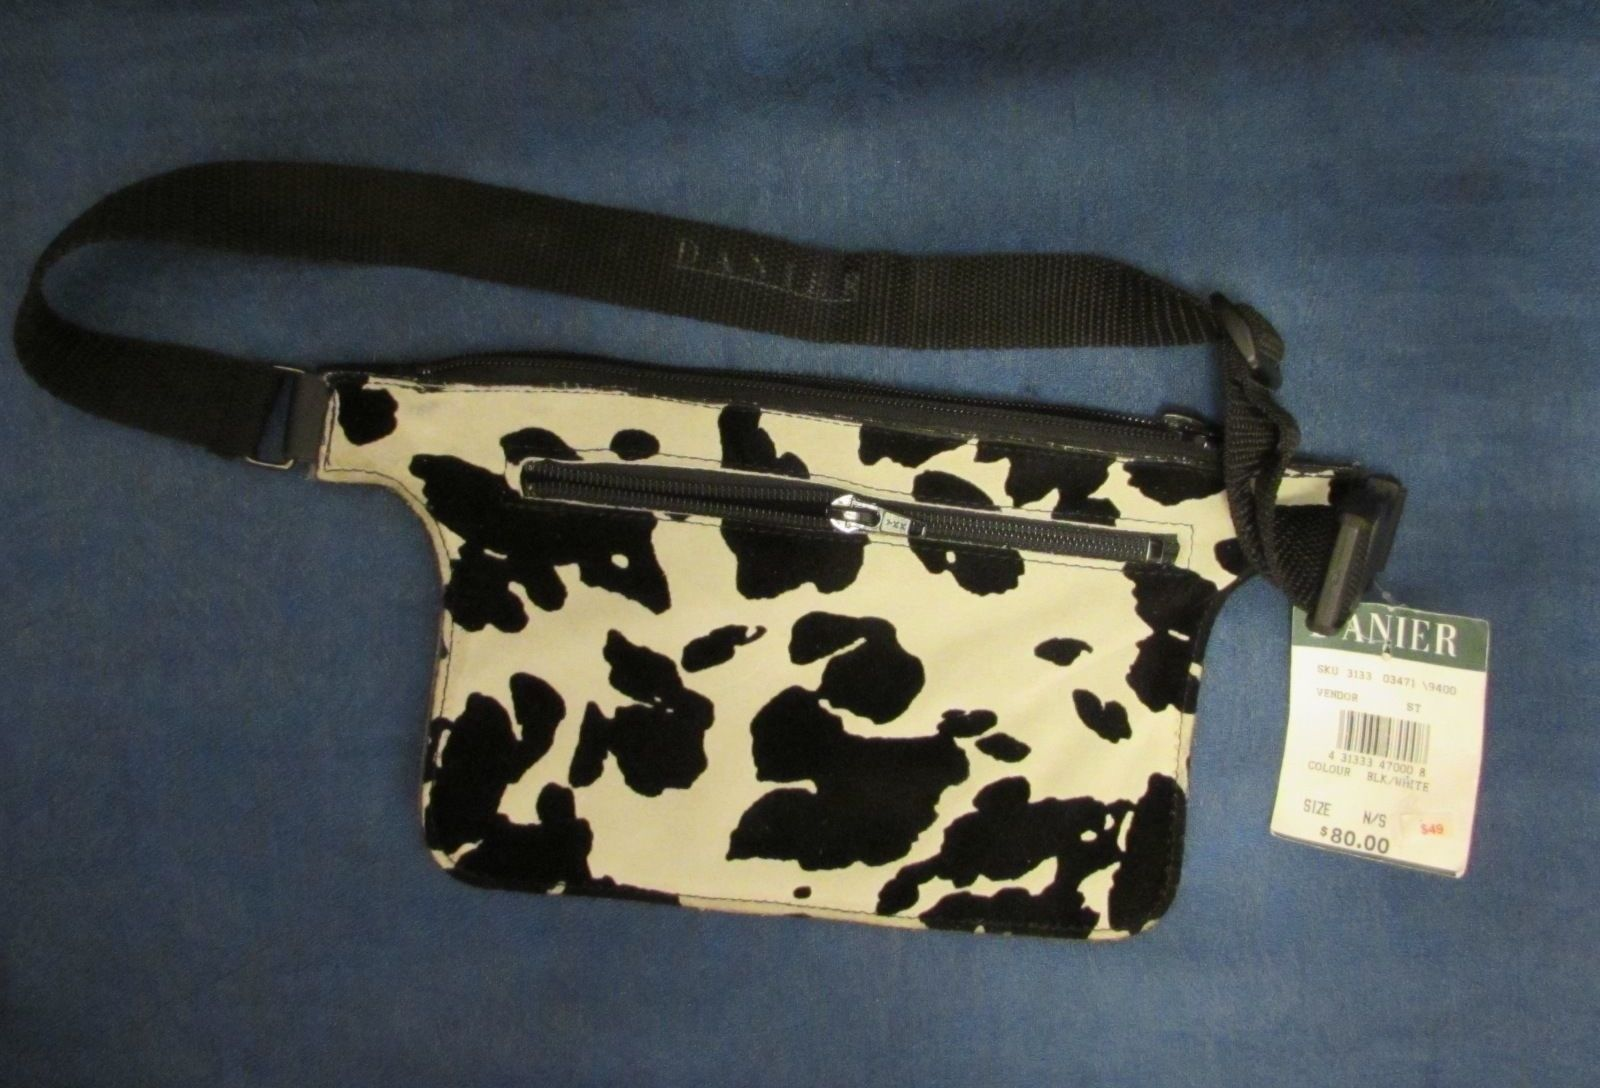 Danier Genuine Leather Waist Pouch/Fanny Pack Color: Black/Pale White Cowhide